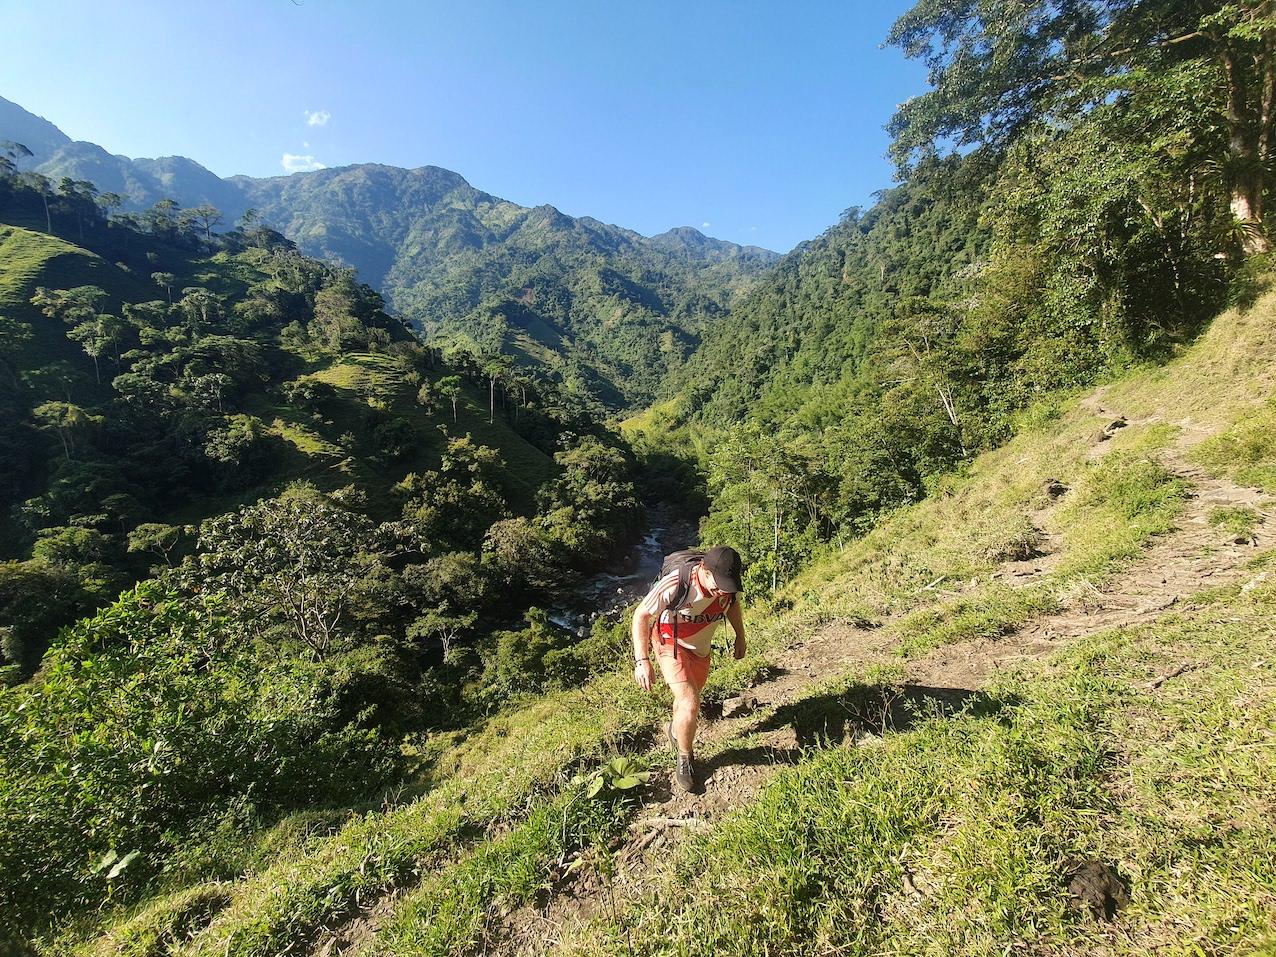 Colombia Cocorna Santo Domingo Hike Piet